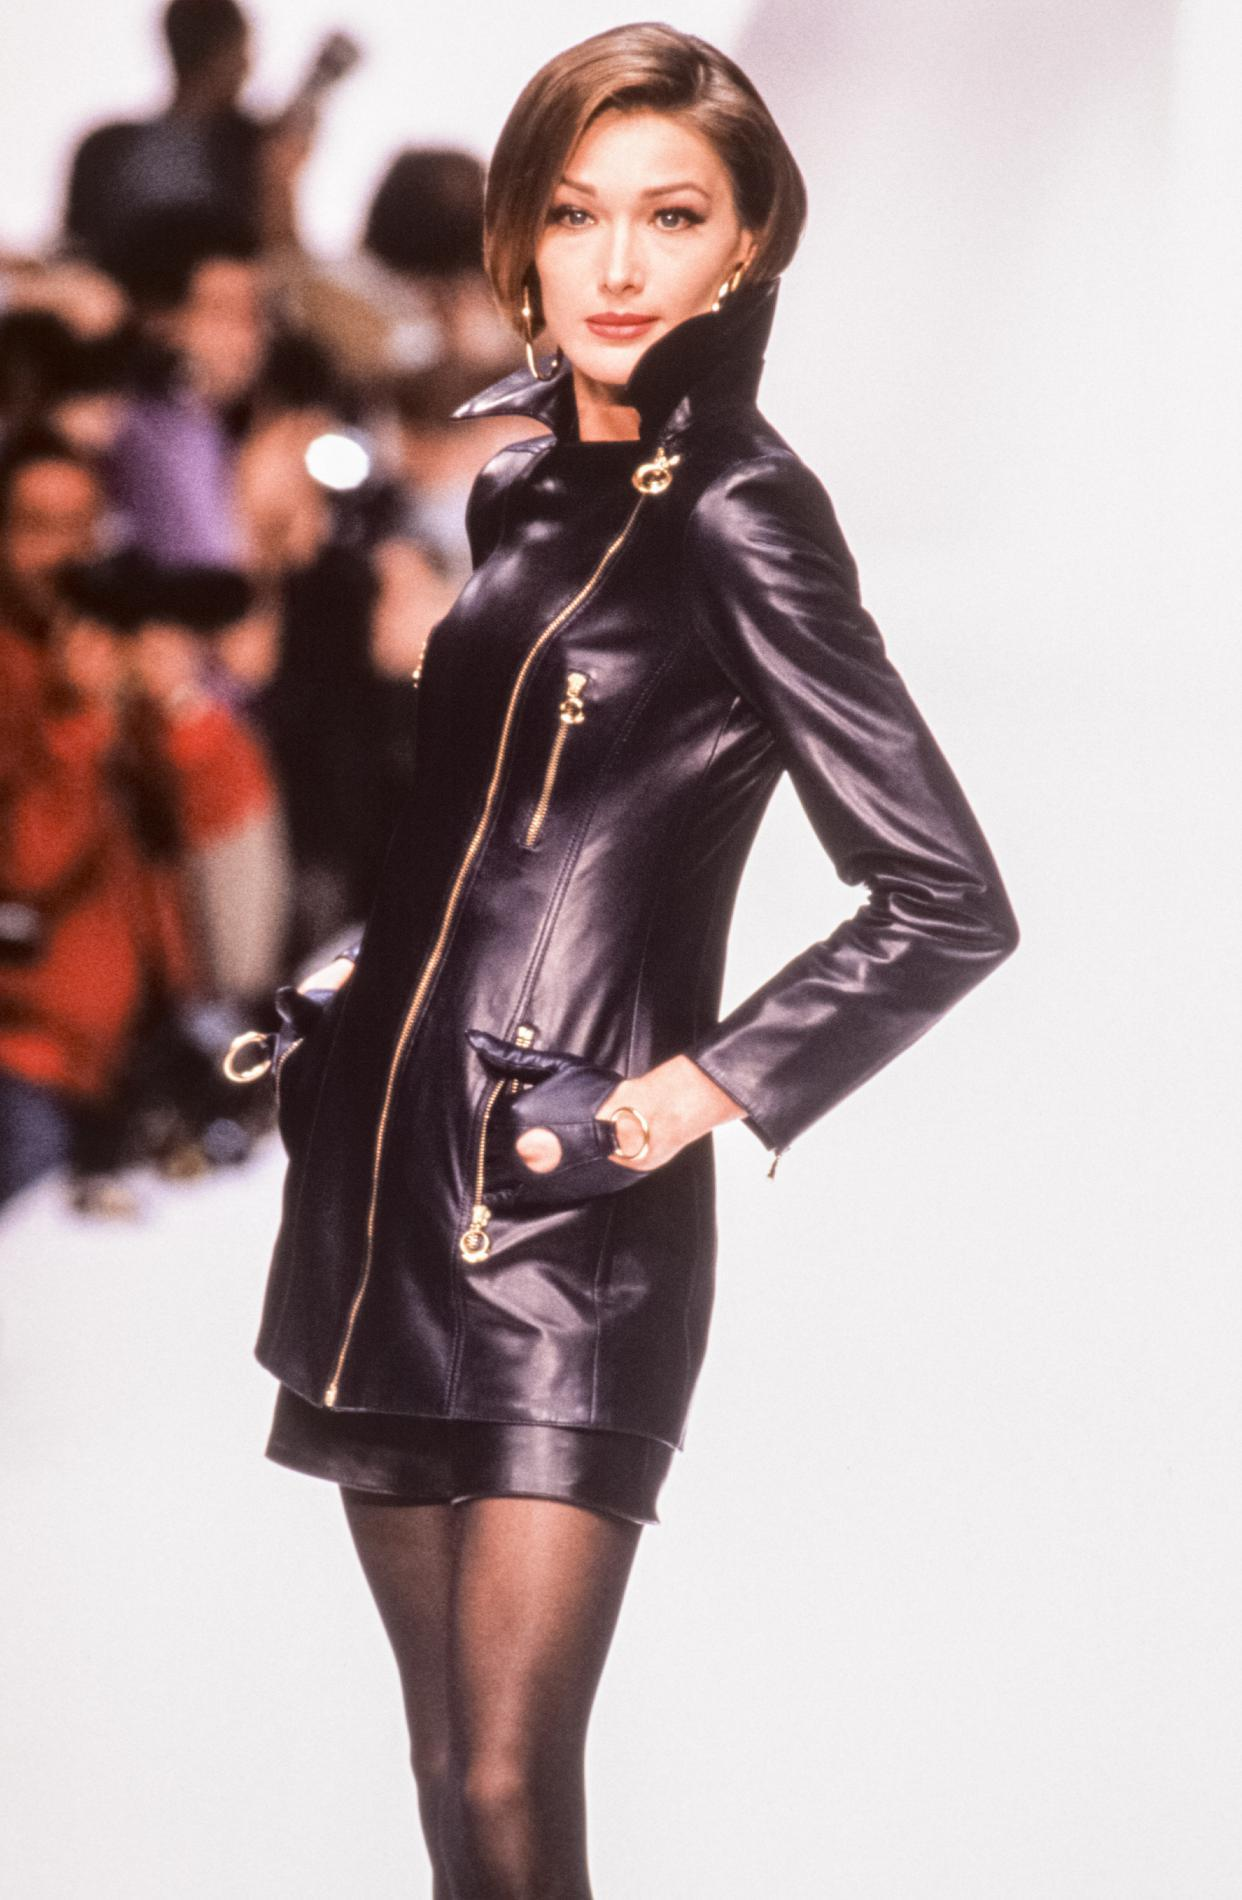 Uma thurman fashion rocks 80